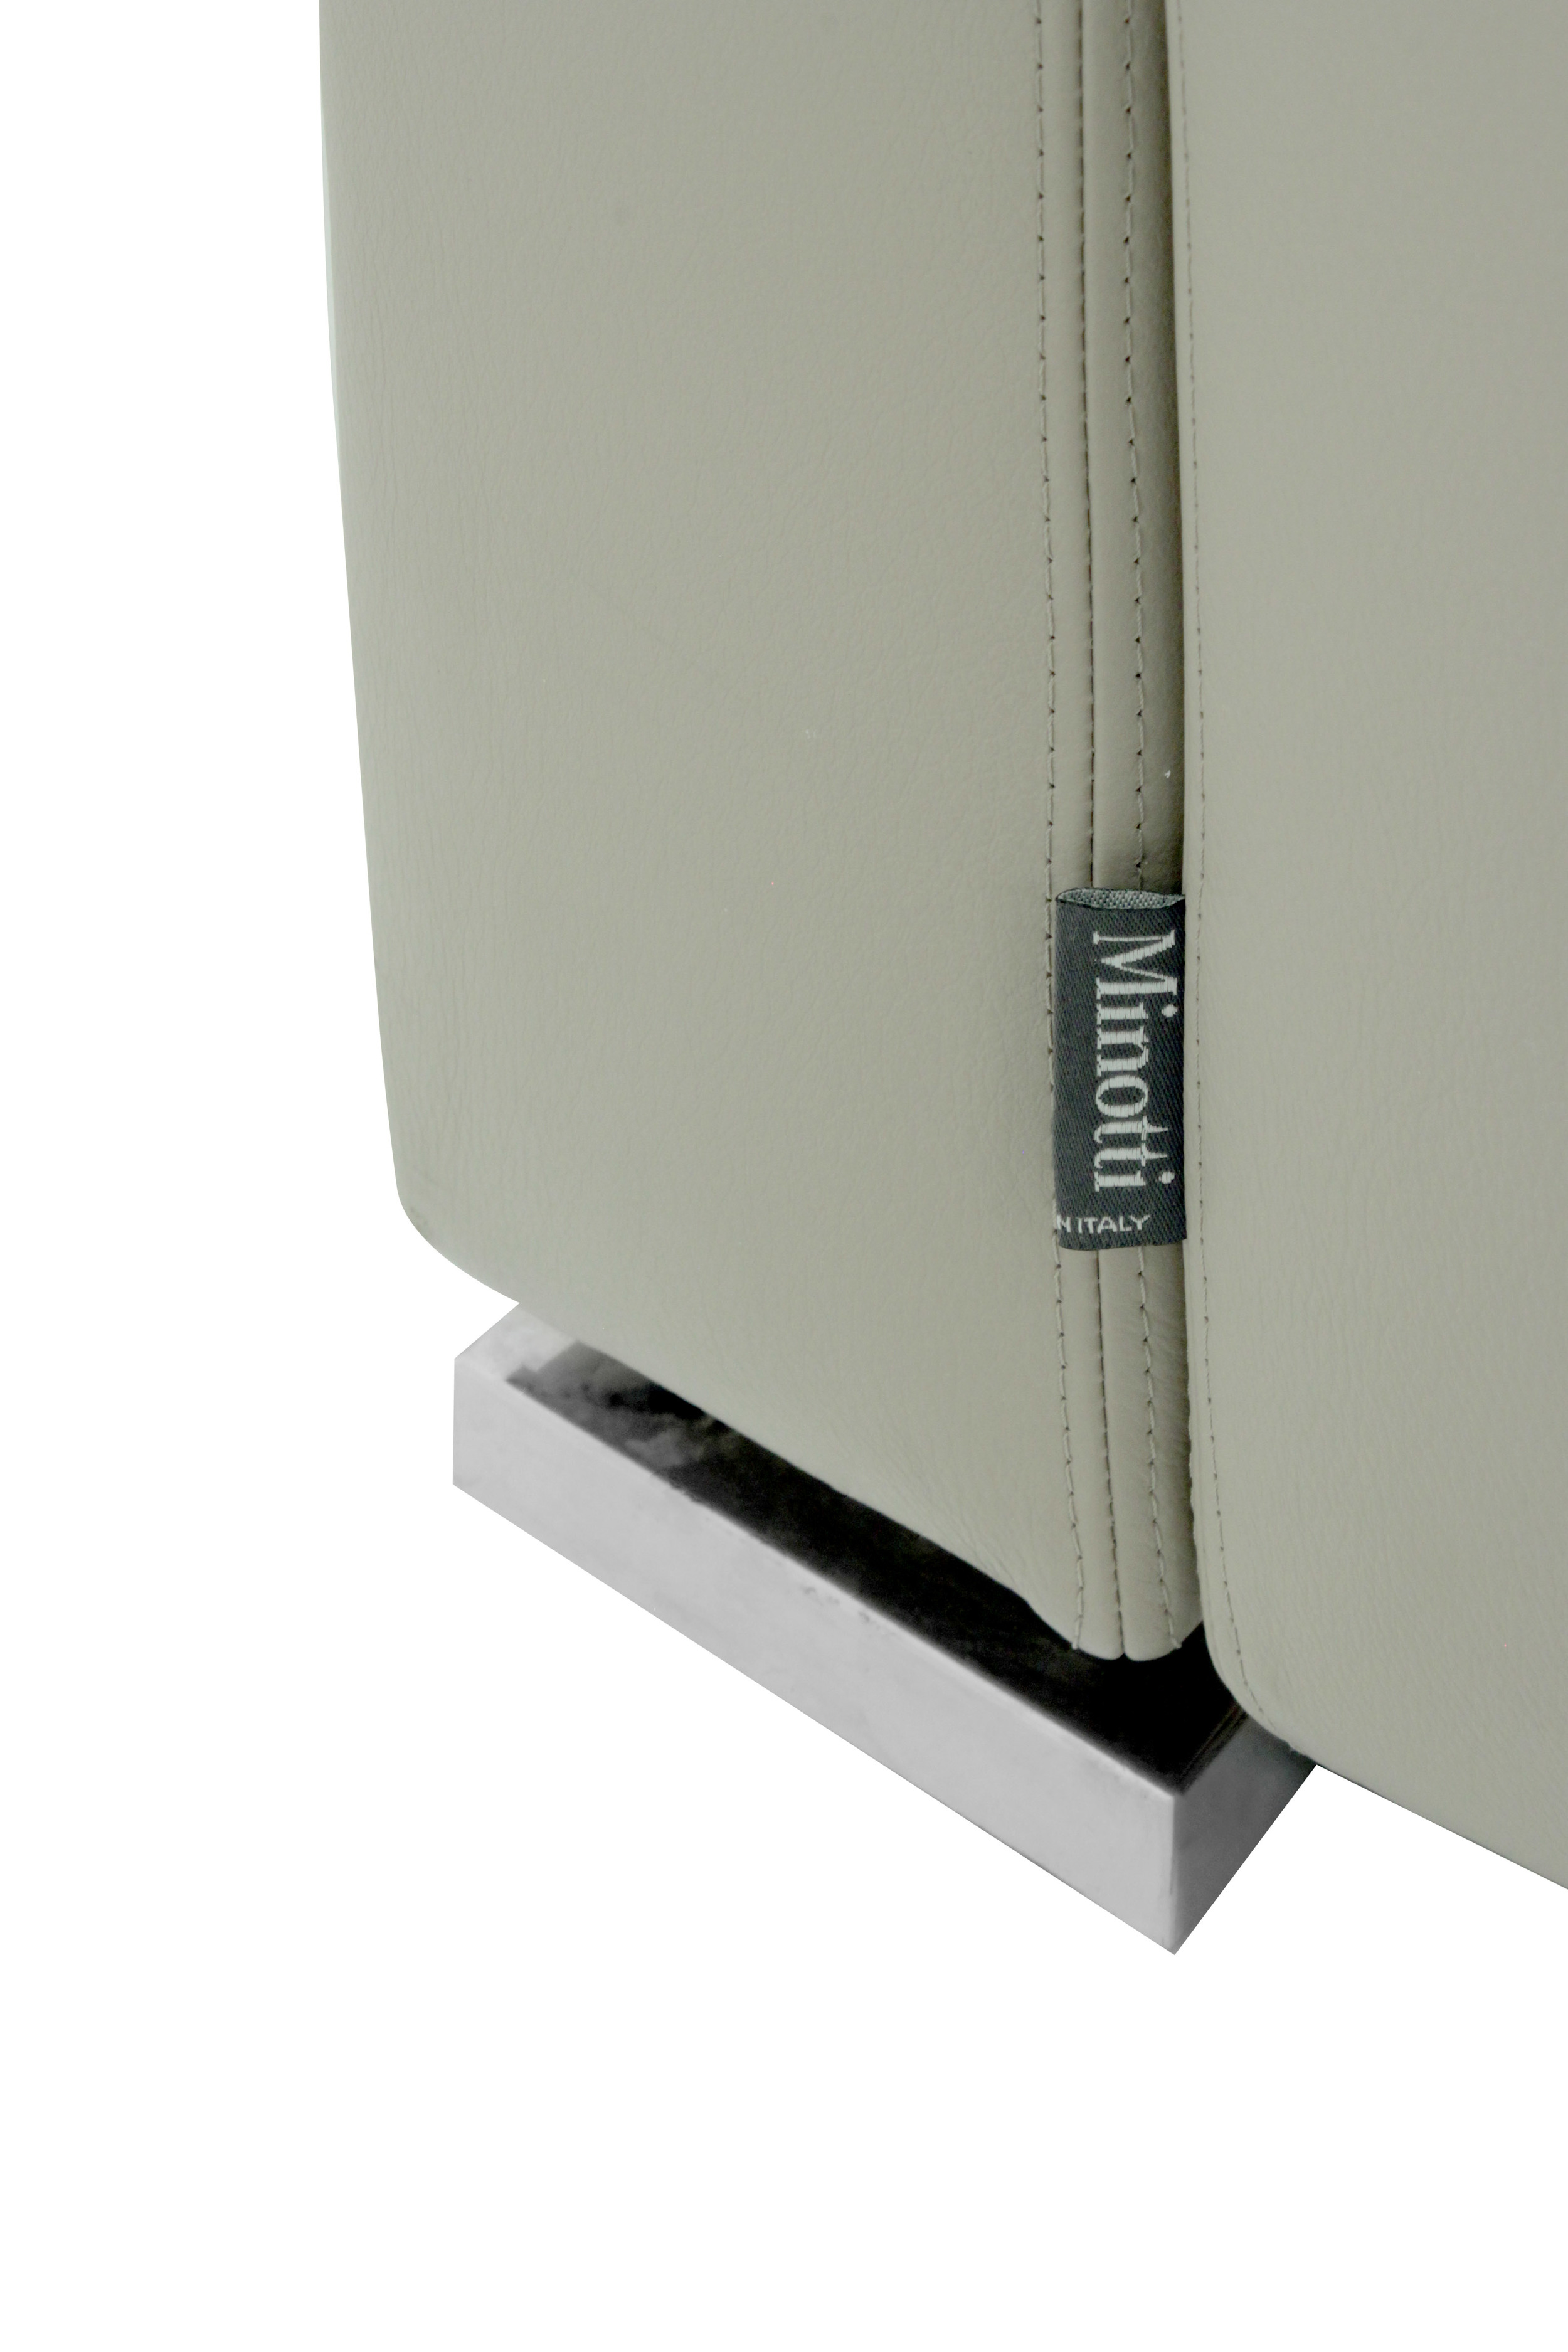 Minotti 65 cleanline lthr clubchairs54 detail4 hires.JPG